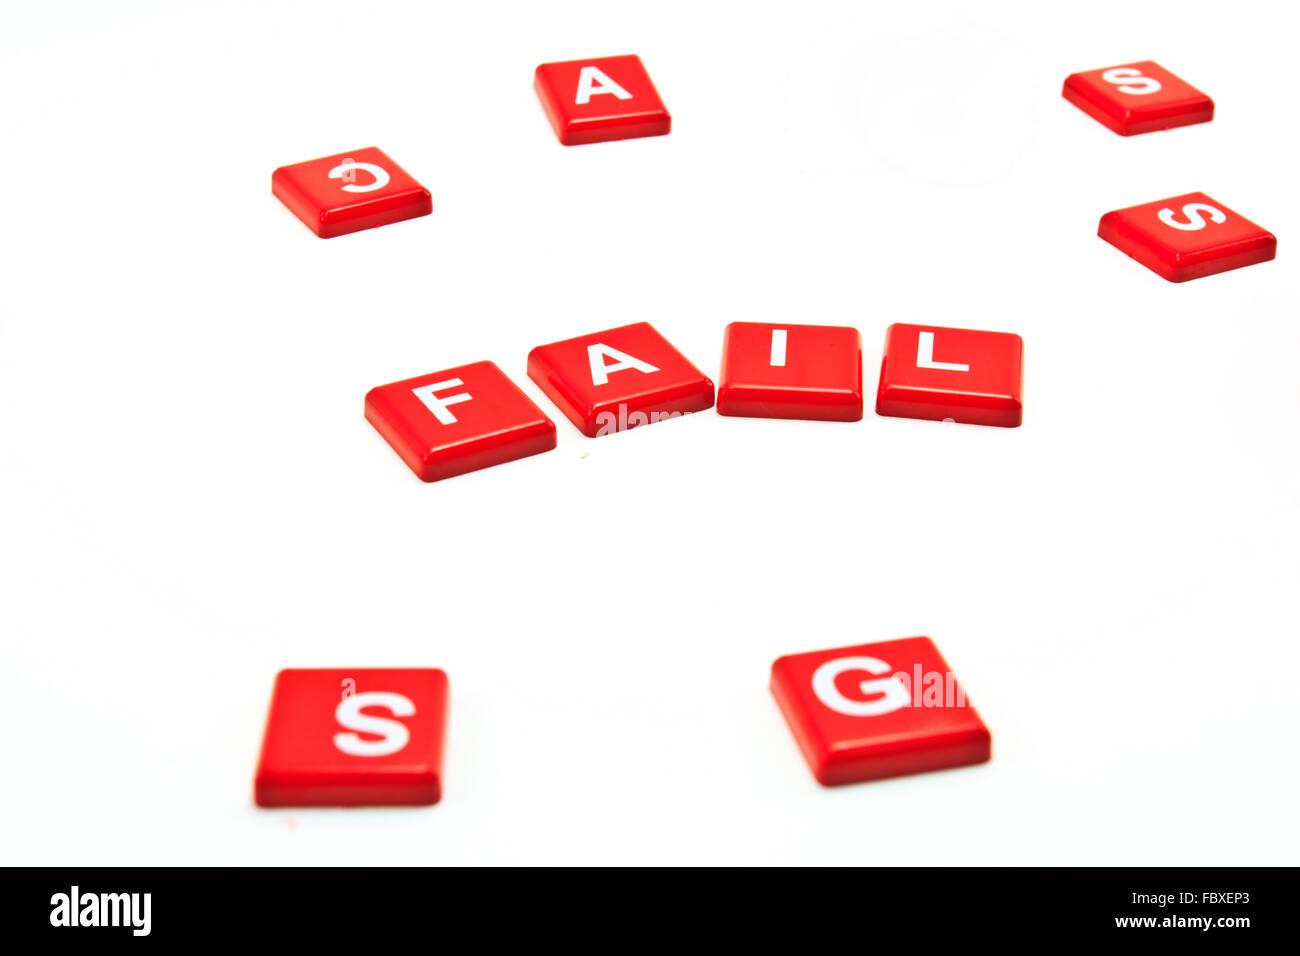 Fail crossword on white background - Stock Image